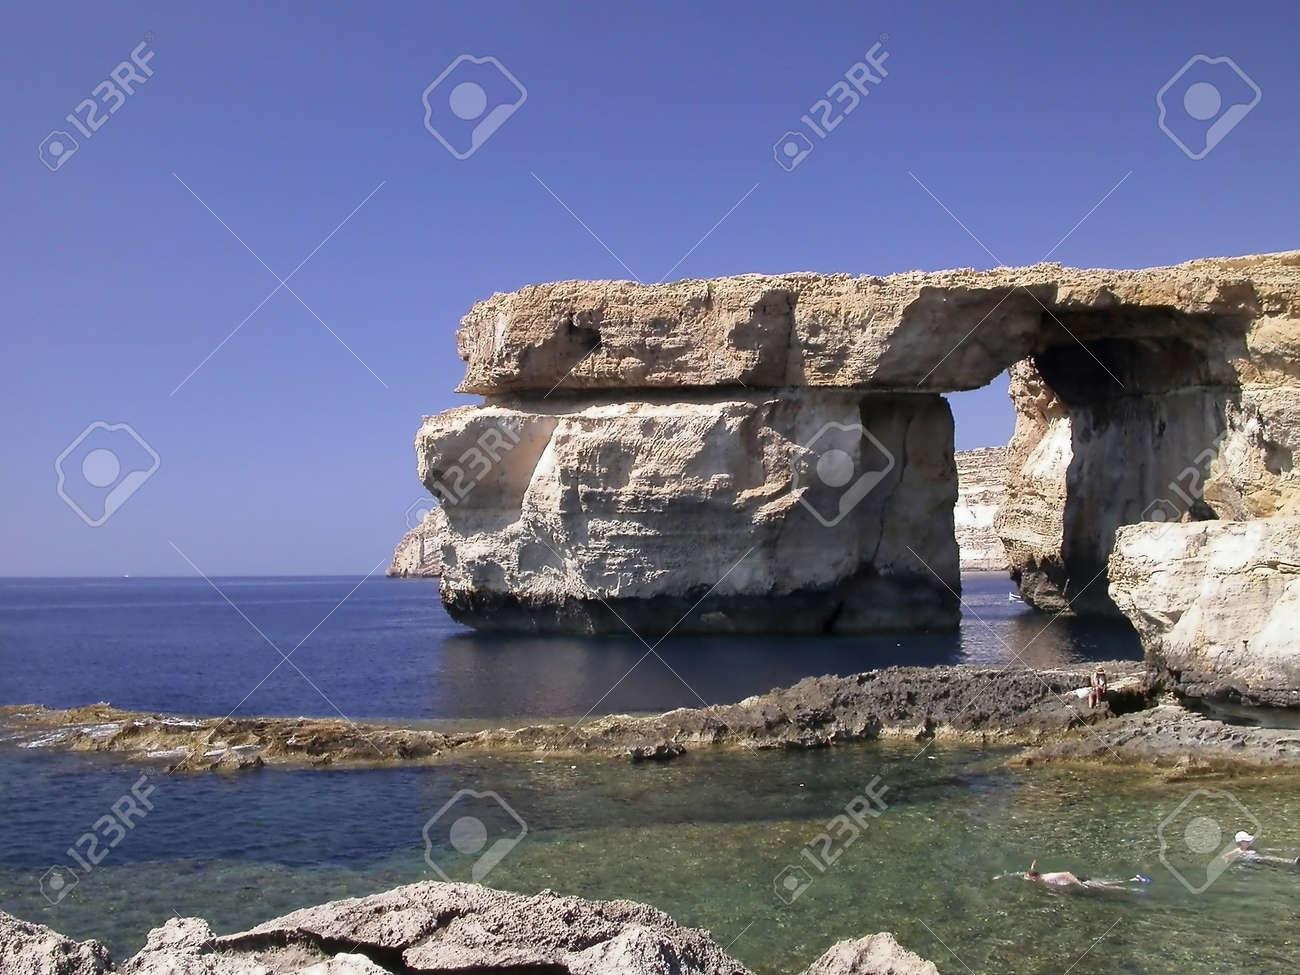 impression of Malta, an island in the mediterranean sea Stock Photo - 1779712